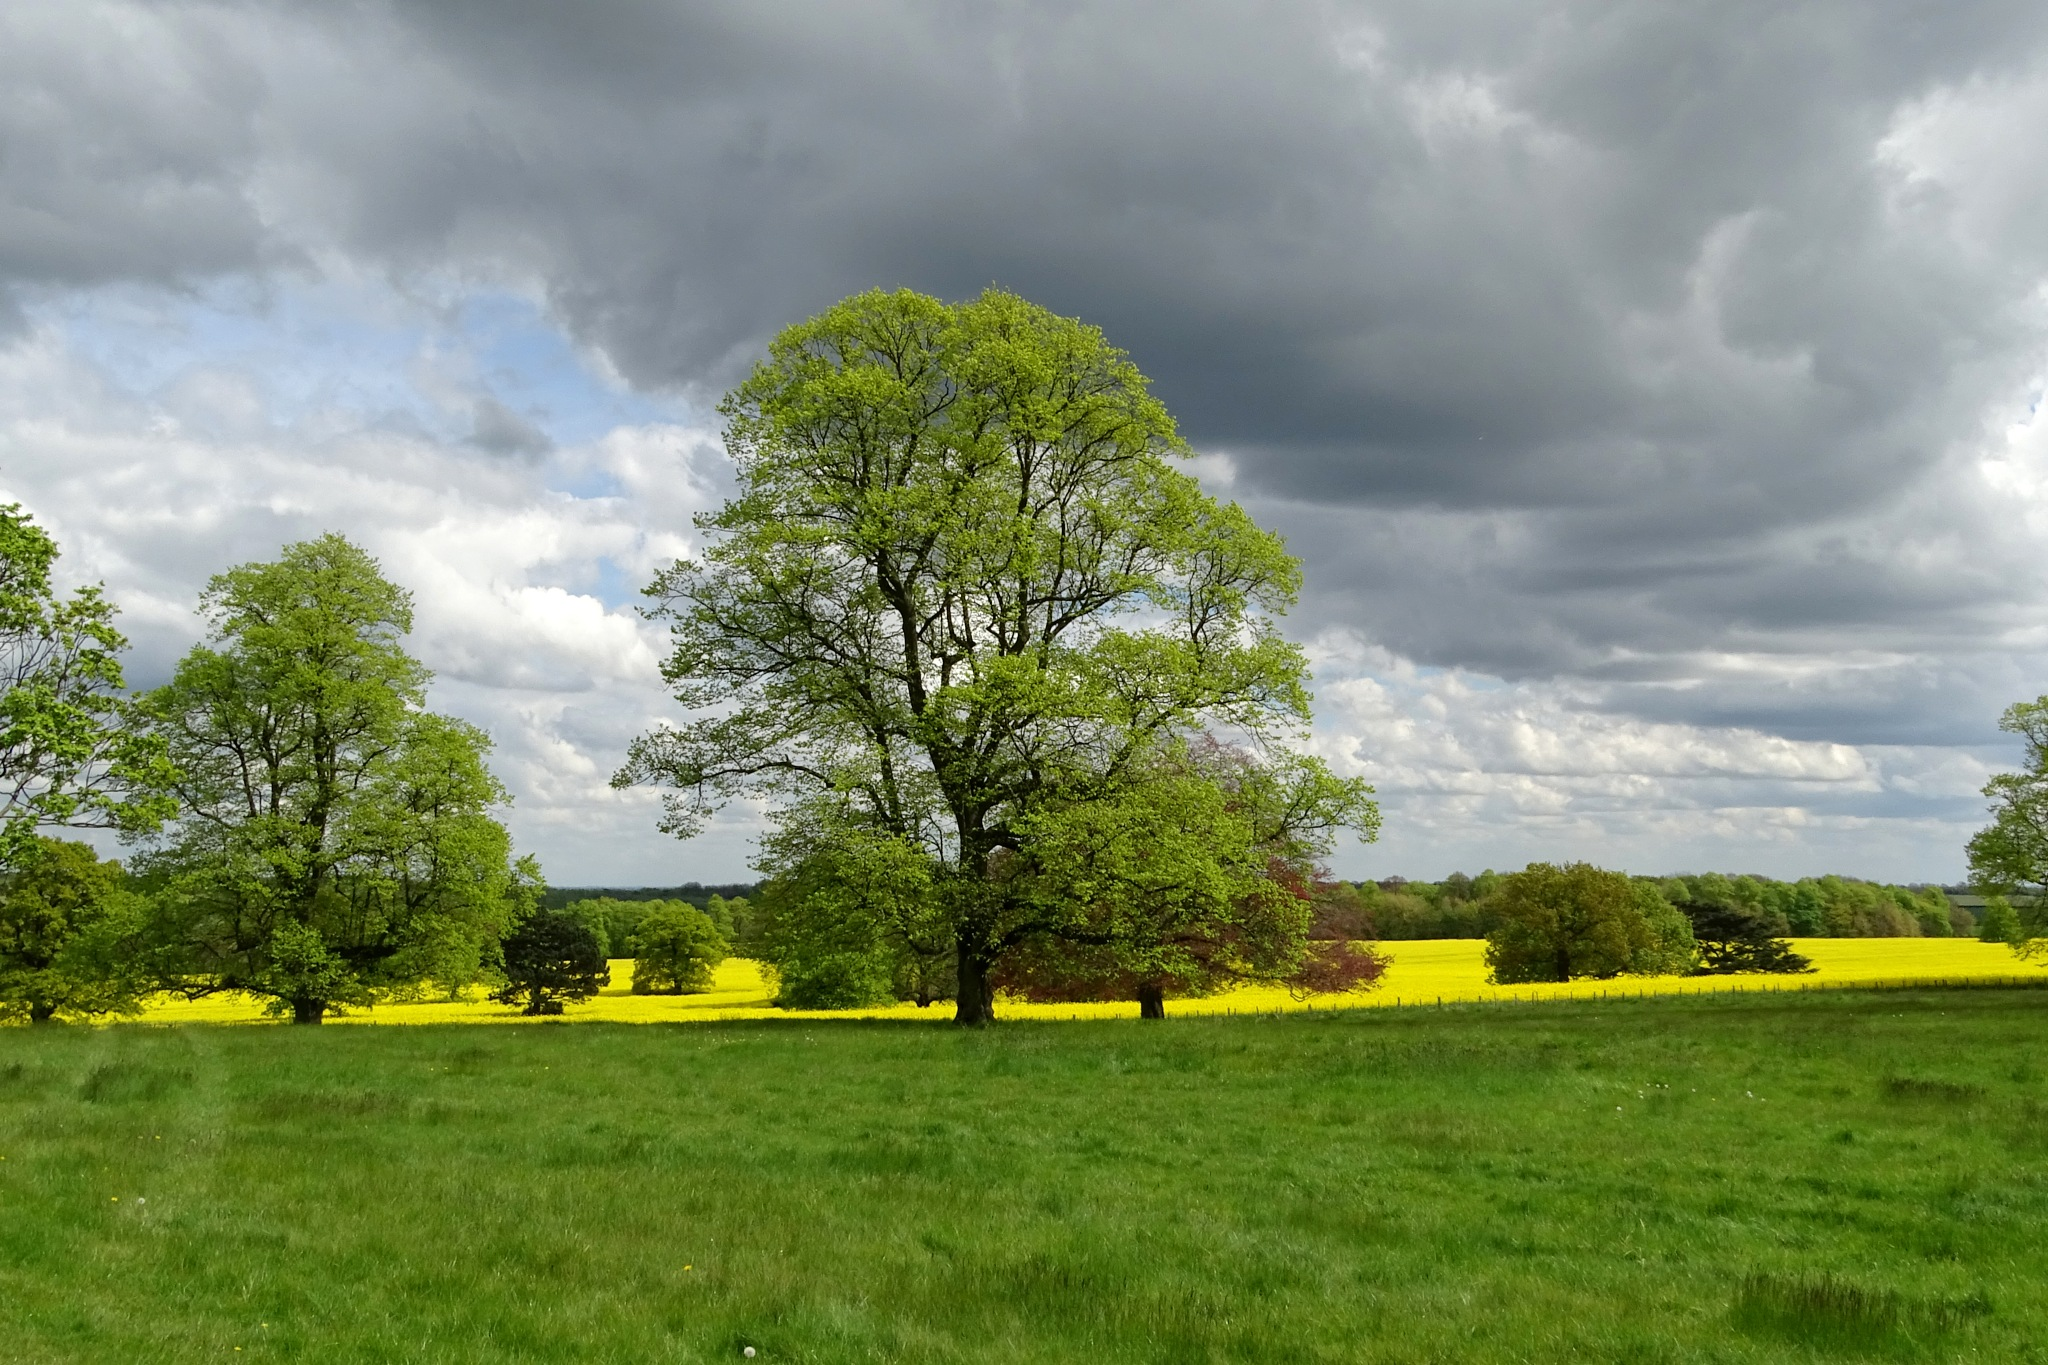 Storm Clouds gather. by kayThornton